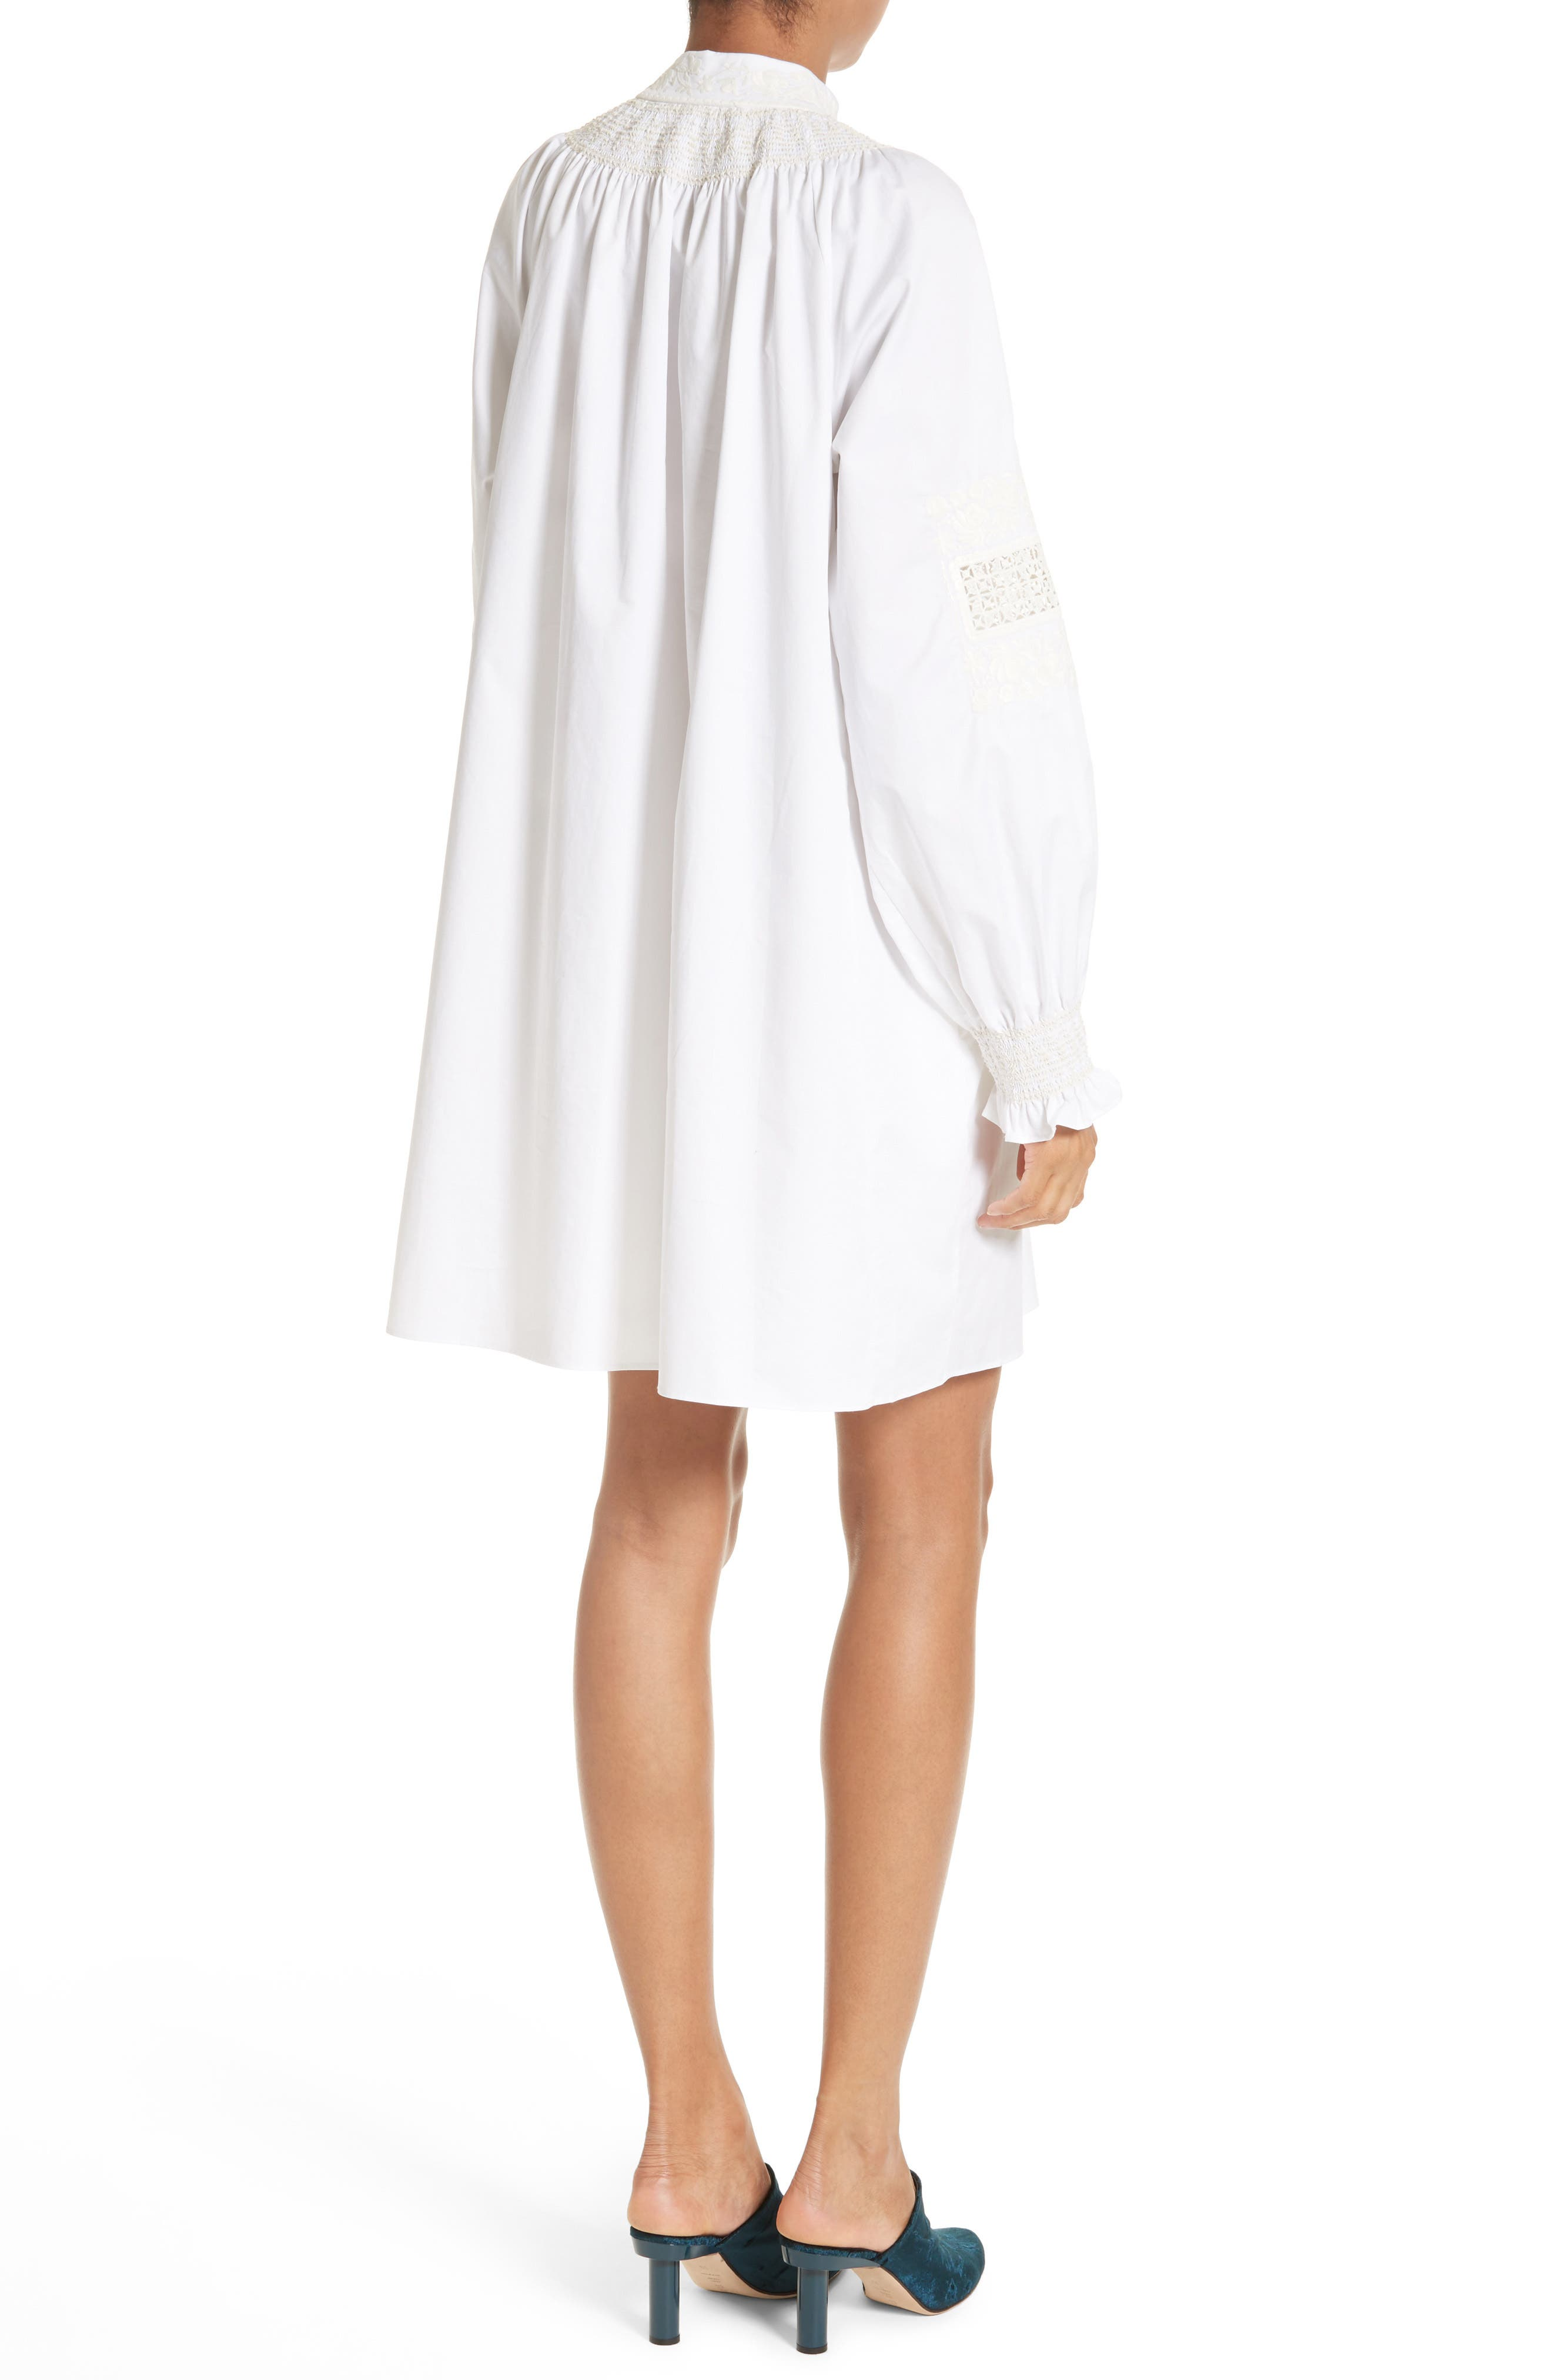 Smocked Tunic Dress,                             Alternate thumbnail 2, color,                             White/ Ivory Multi